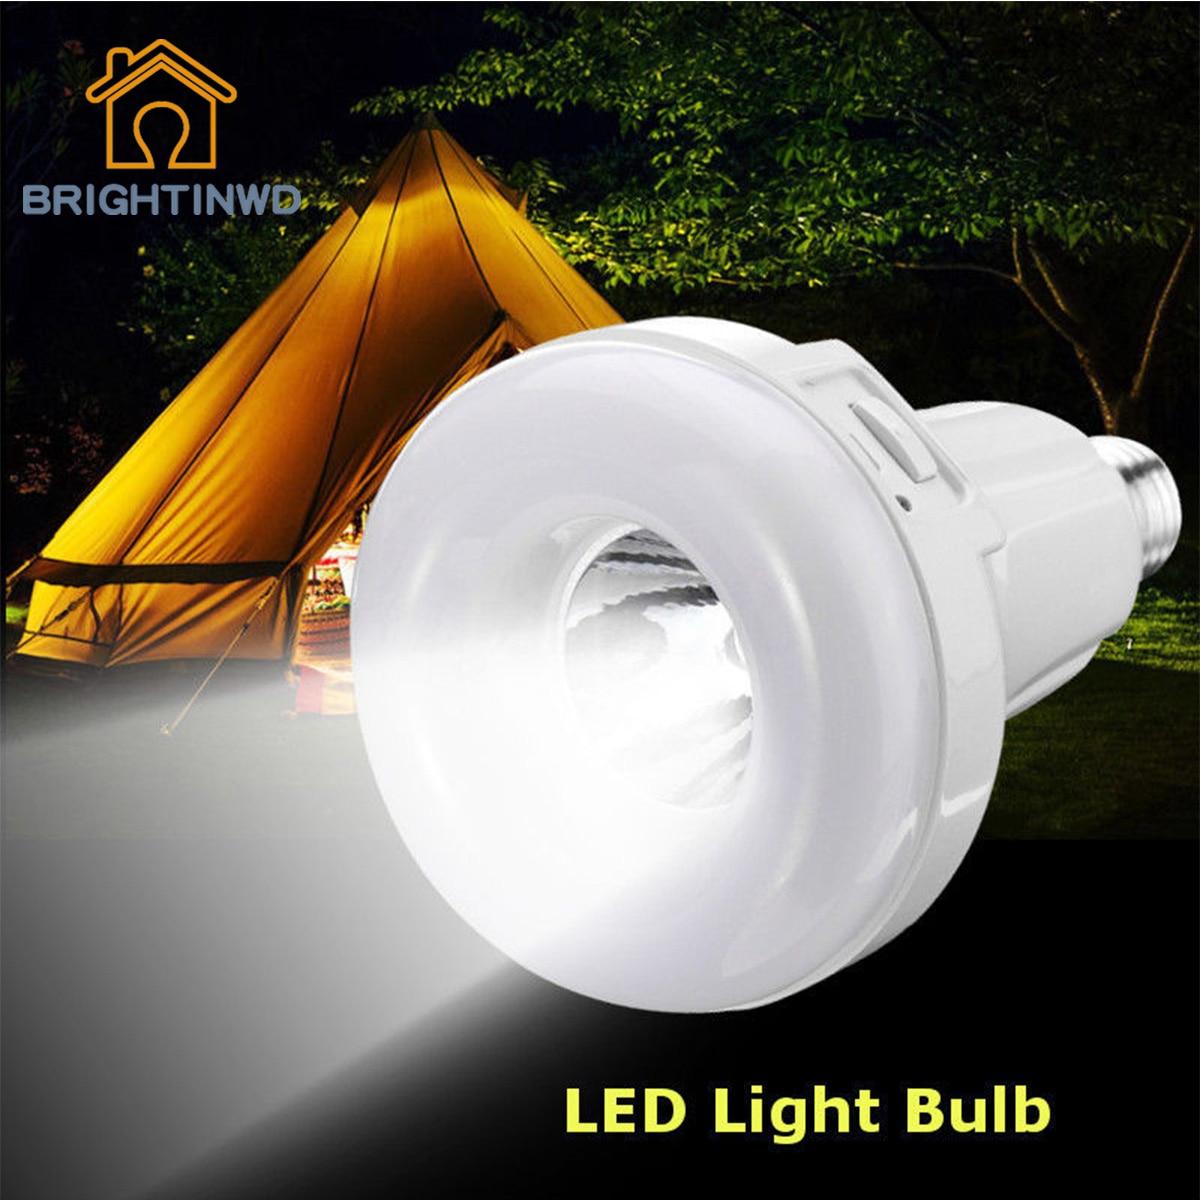 BRIGHTINWD LED E27 Energy Saving Rechargeable Intelligent Light Bulb Lamp Emergency Lights